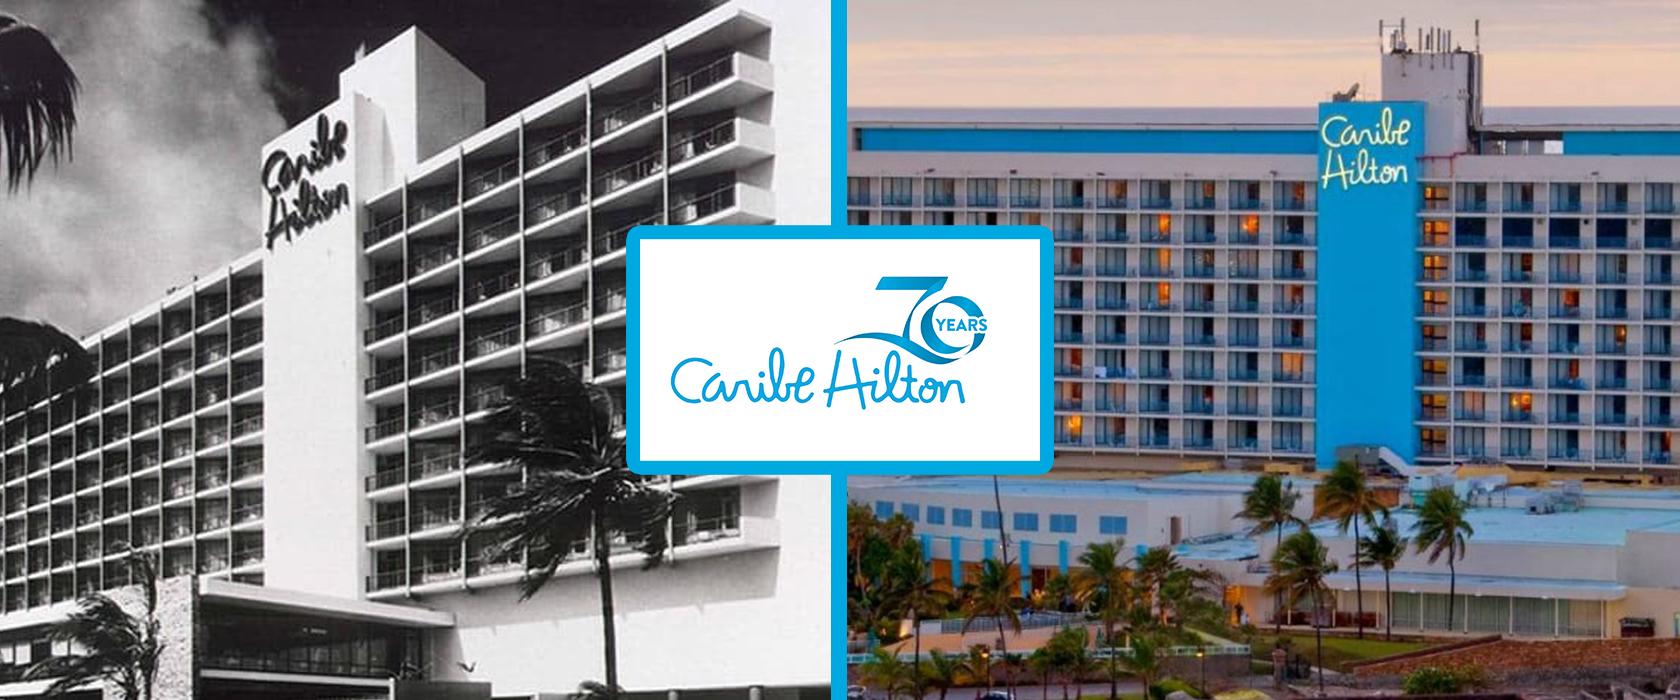 70 Iconic Years at Caribe Hilton